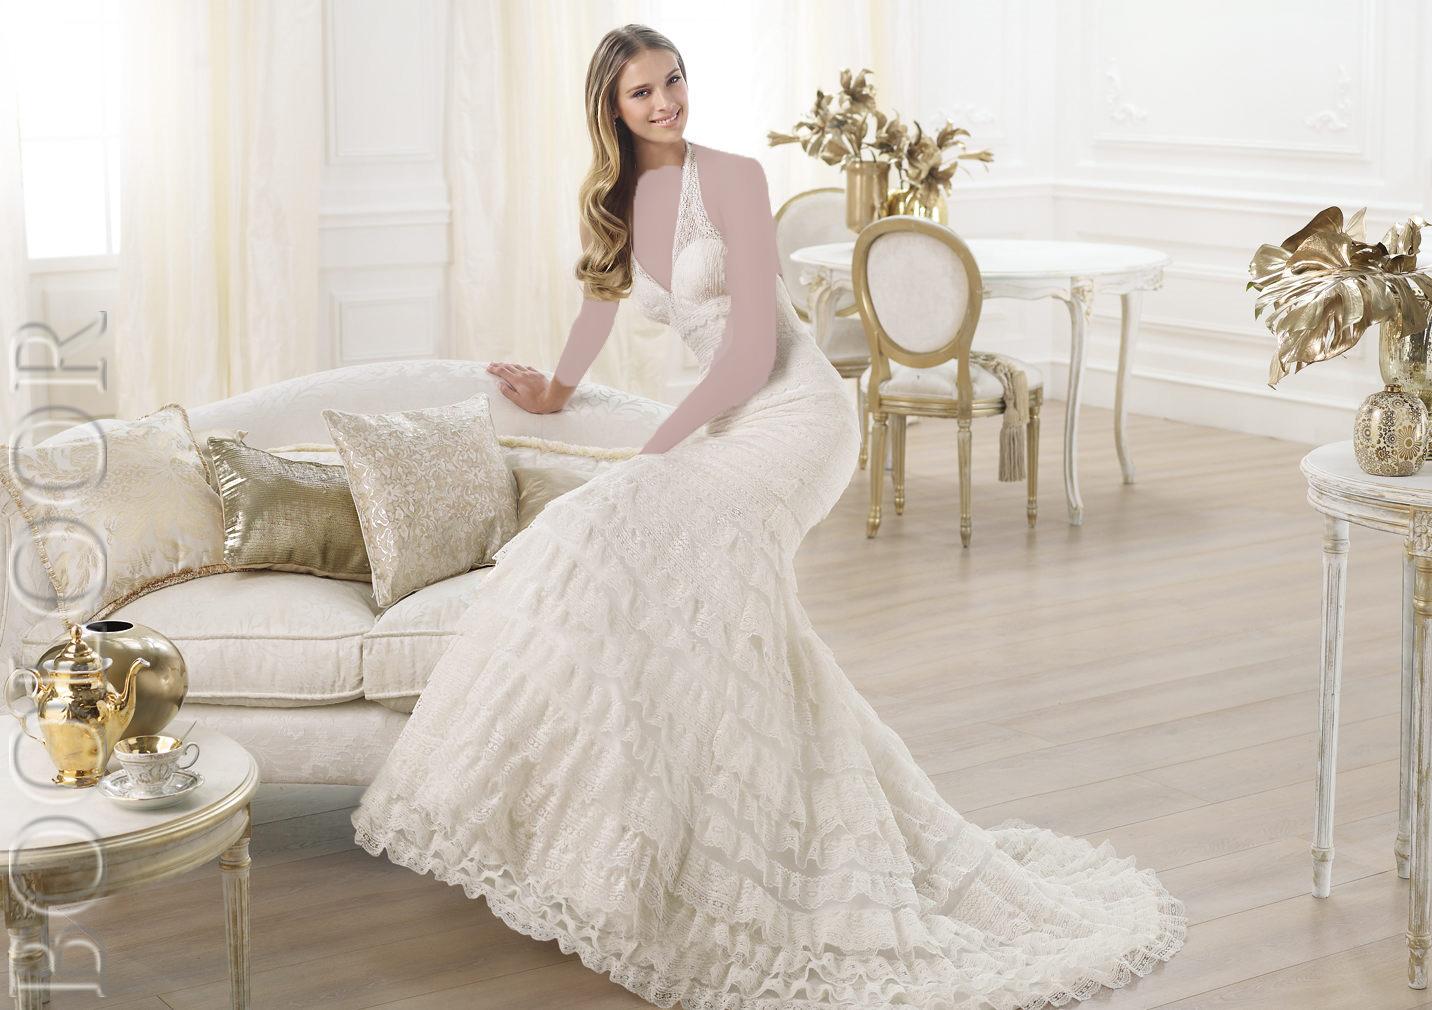 لباس عروس مزون لباس عروس لباس عروس گیپور مدل لباس عروس